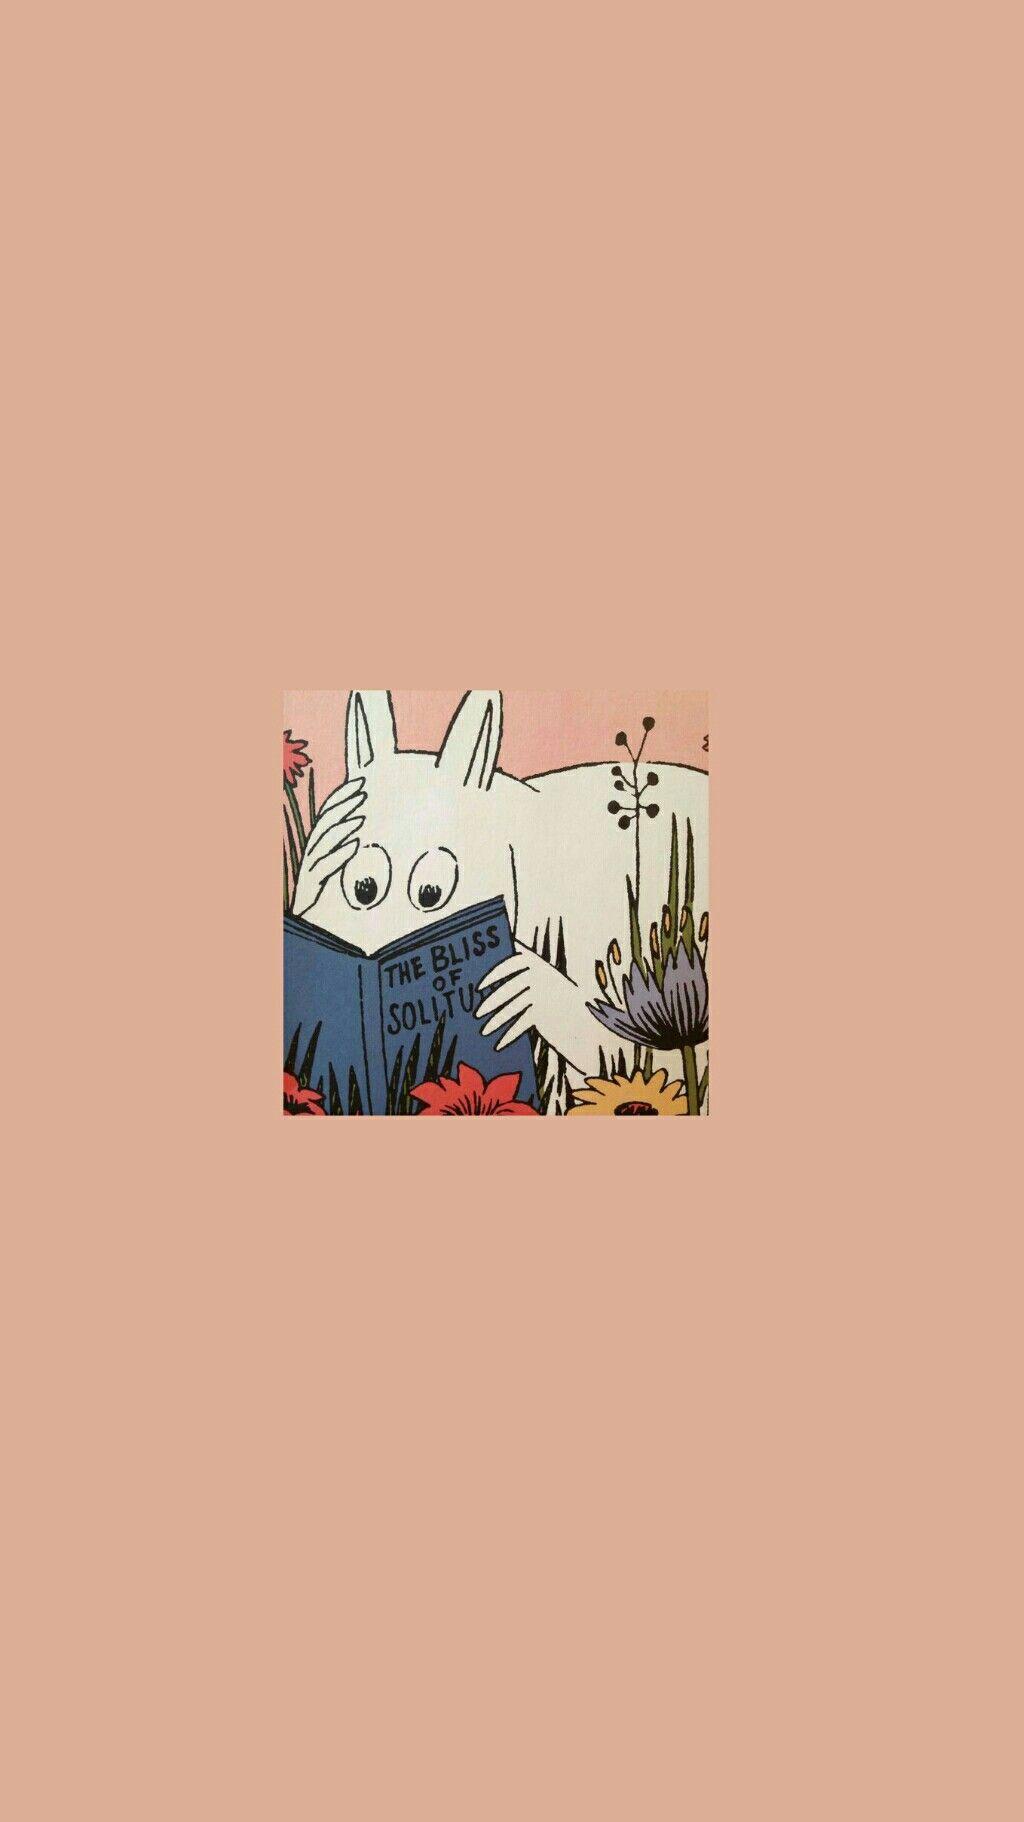 Moomin Wallpaper ムーミン 壁紙 壁紙 絵